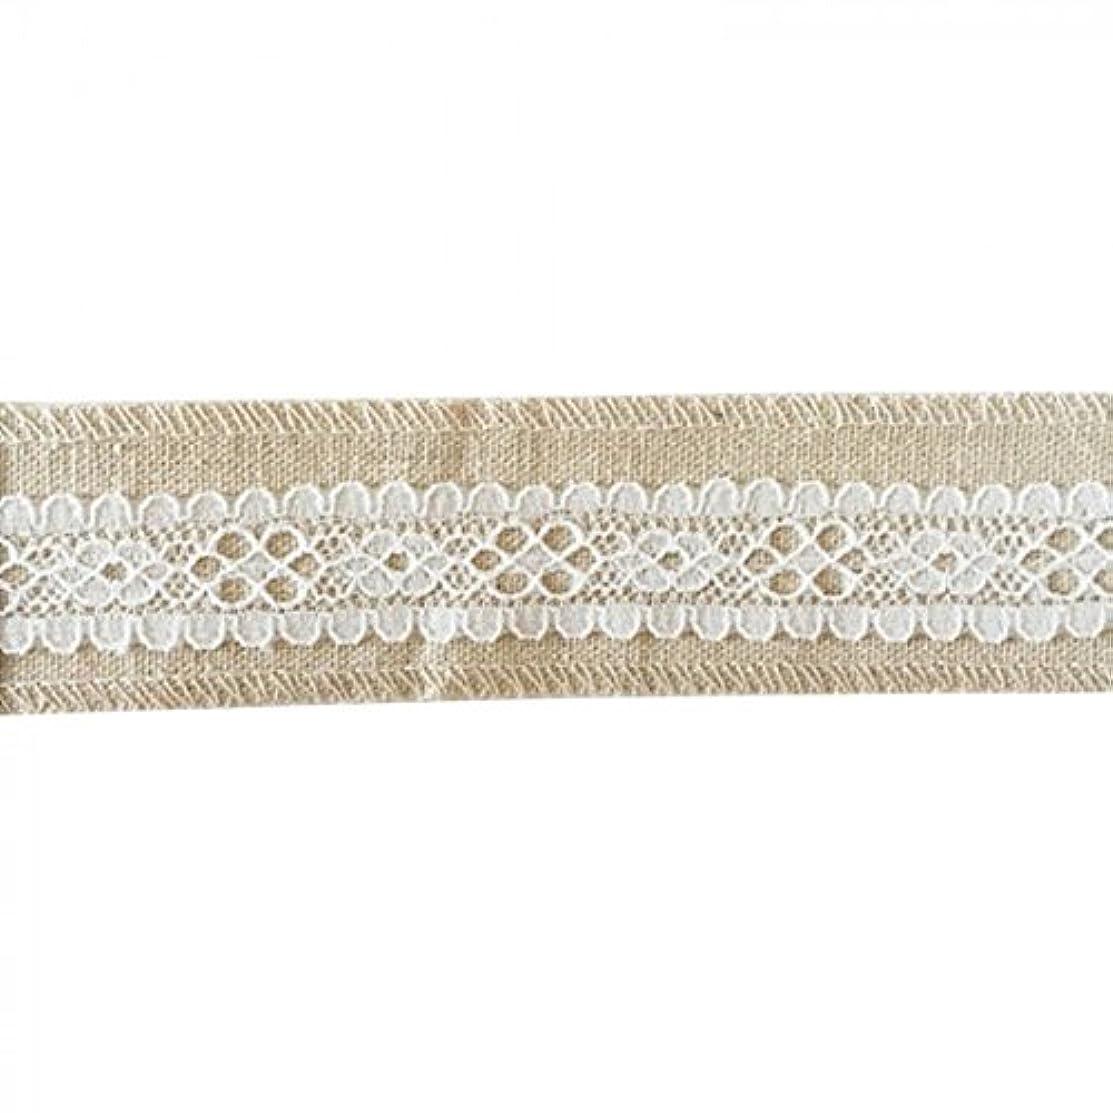 Vaessen Creative Sewing Ribbon, Fabric, White/Ecru, One Size